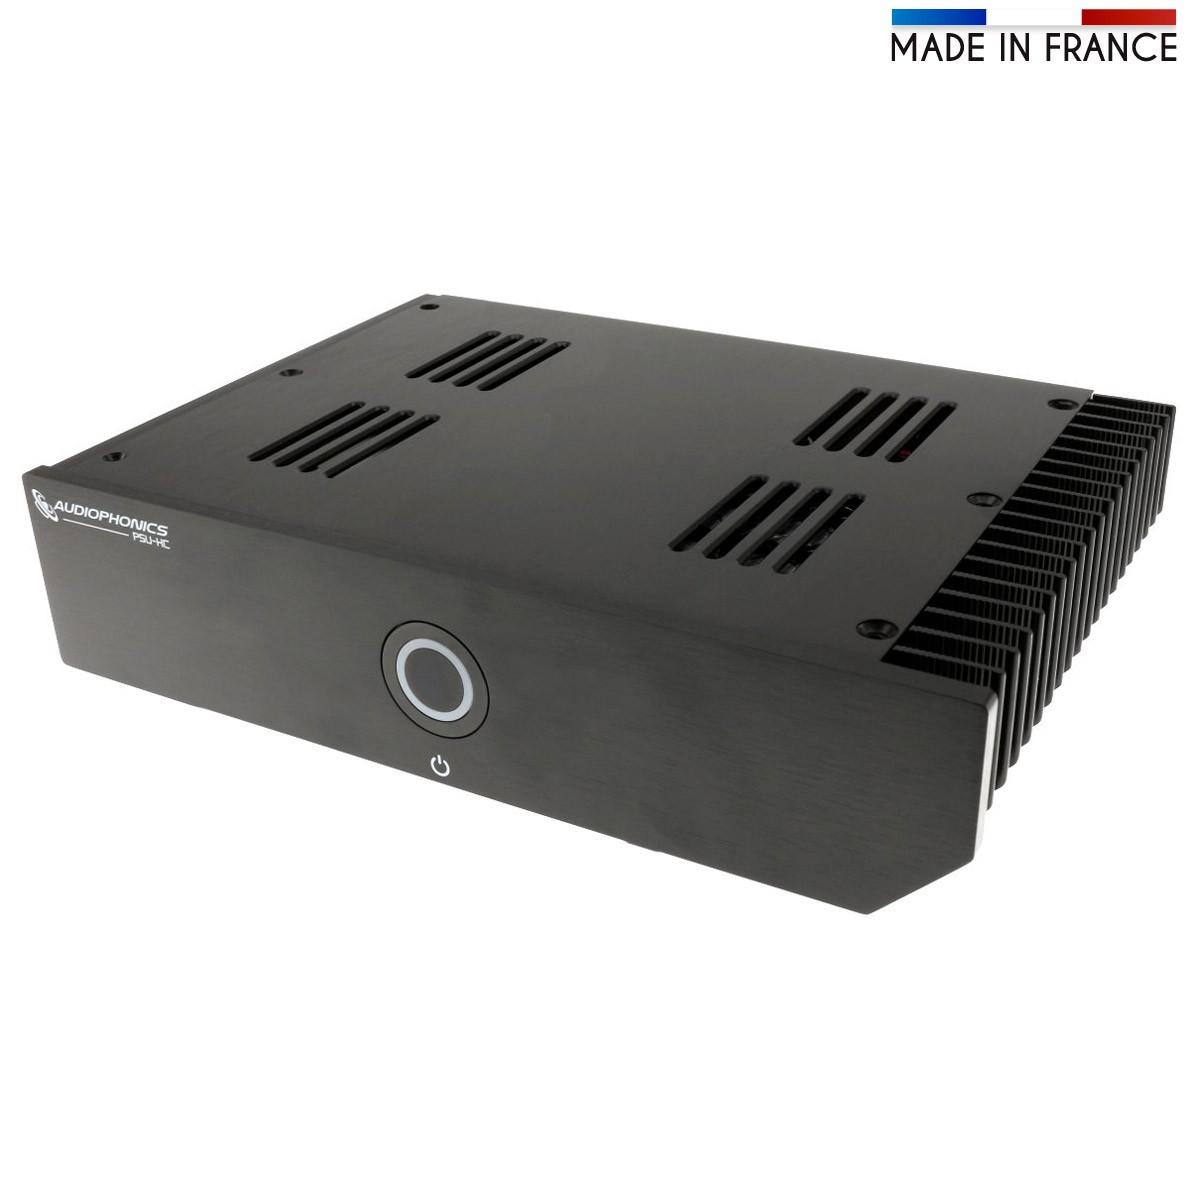 AUDIOPHONICS PSU-HC Linear Regulated Power Supply 12V 5A 100VA